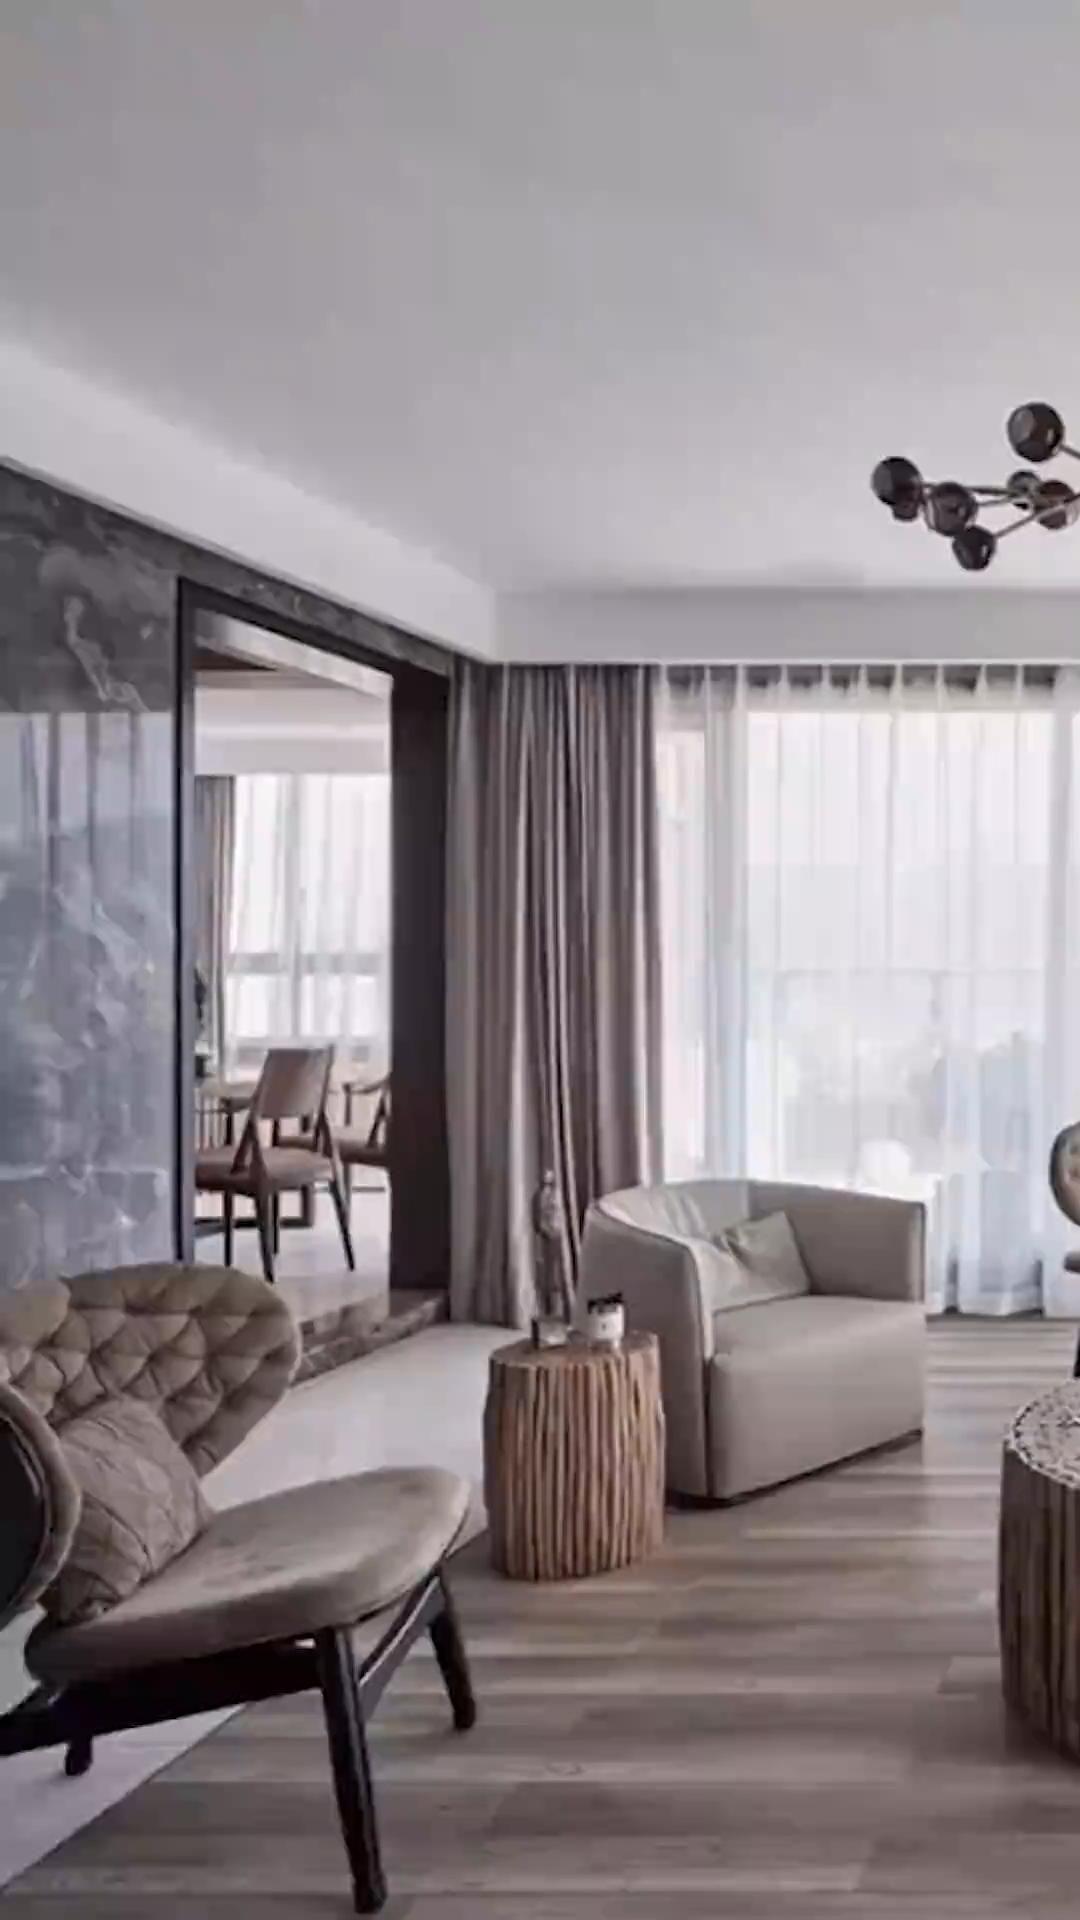 Custom Furniture Luxury Furniture Manufacturer From China Video Video In 2020 Home Interior Design Furniture Design Living Room Design Small Spaces